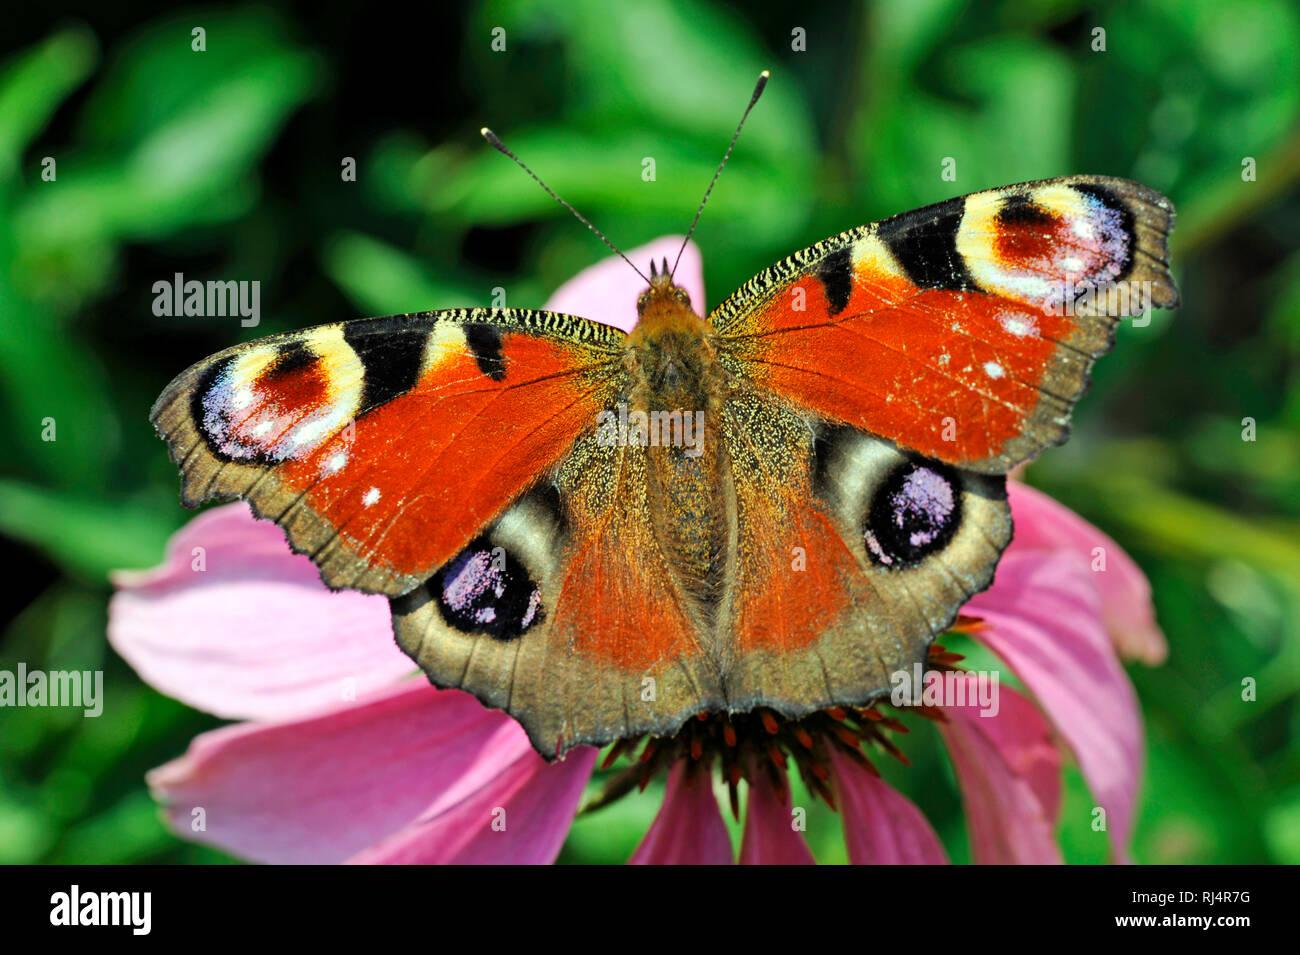 Schmetterling, Tagpfauenauge, Bl?te, - Stock Image